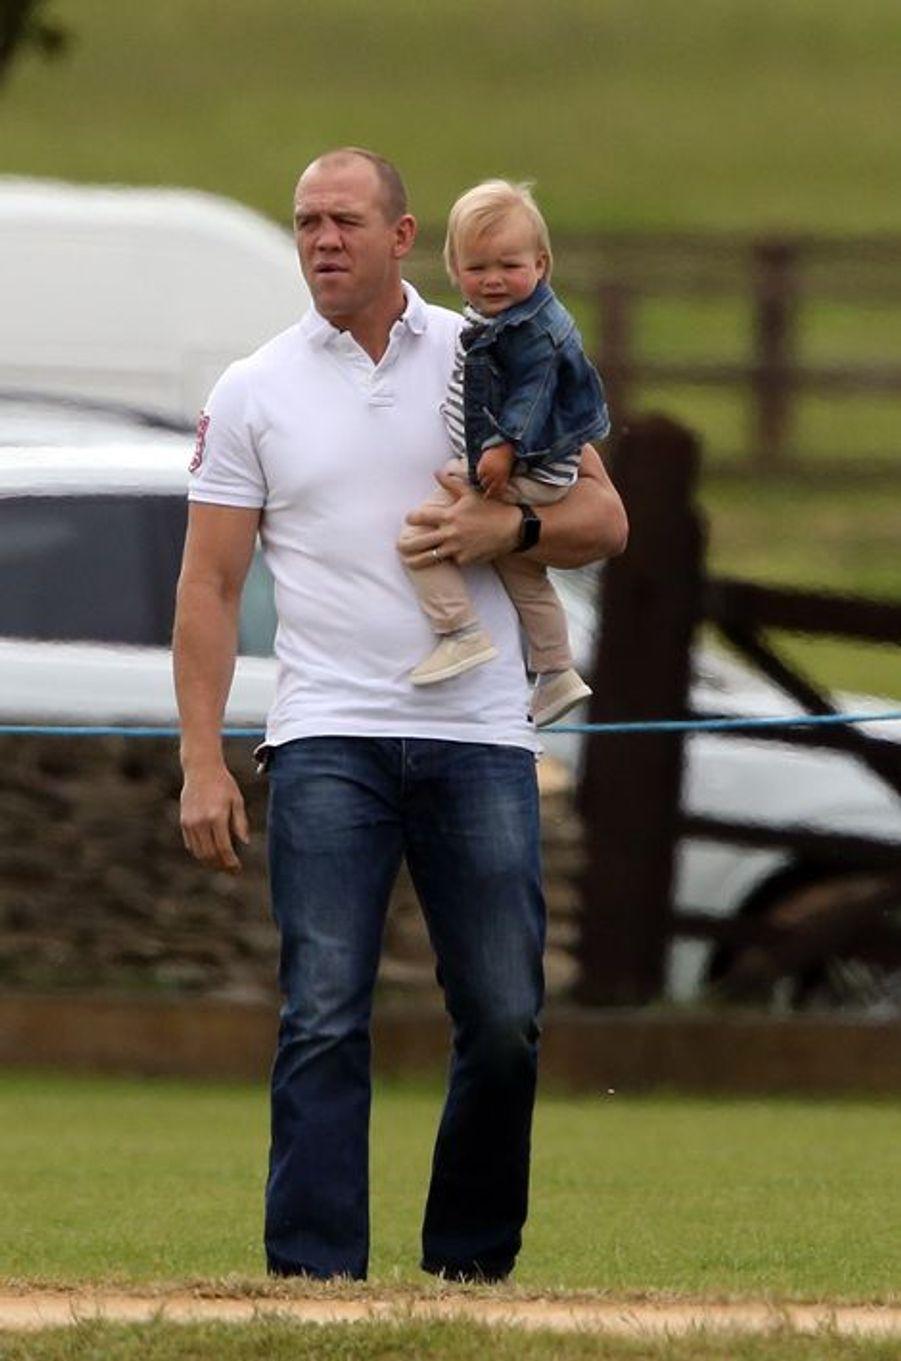 Mike Tendall et sa fille Mia à Tetbury, le 14 juin 2015